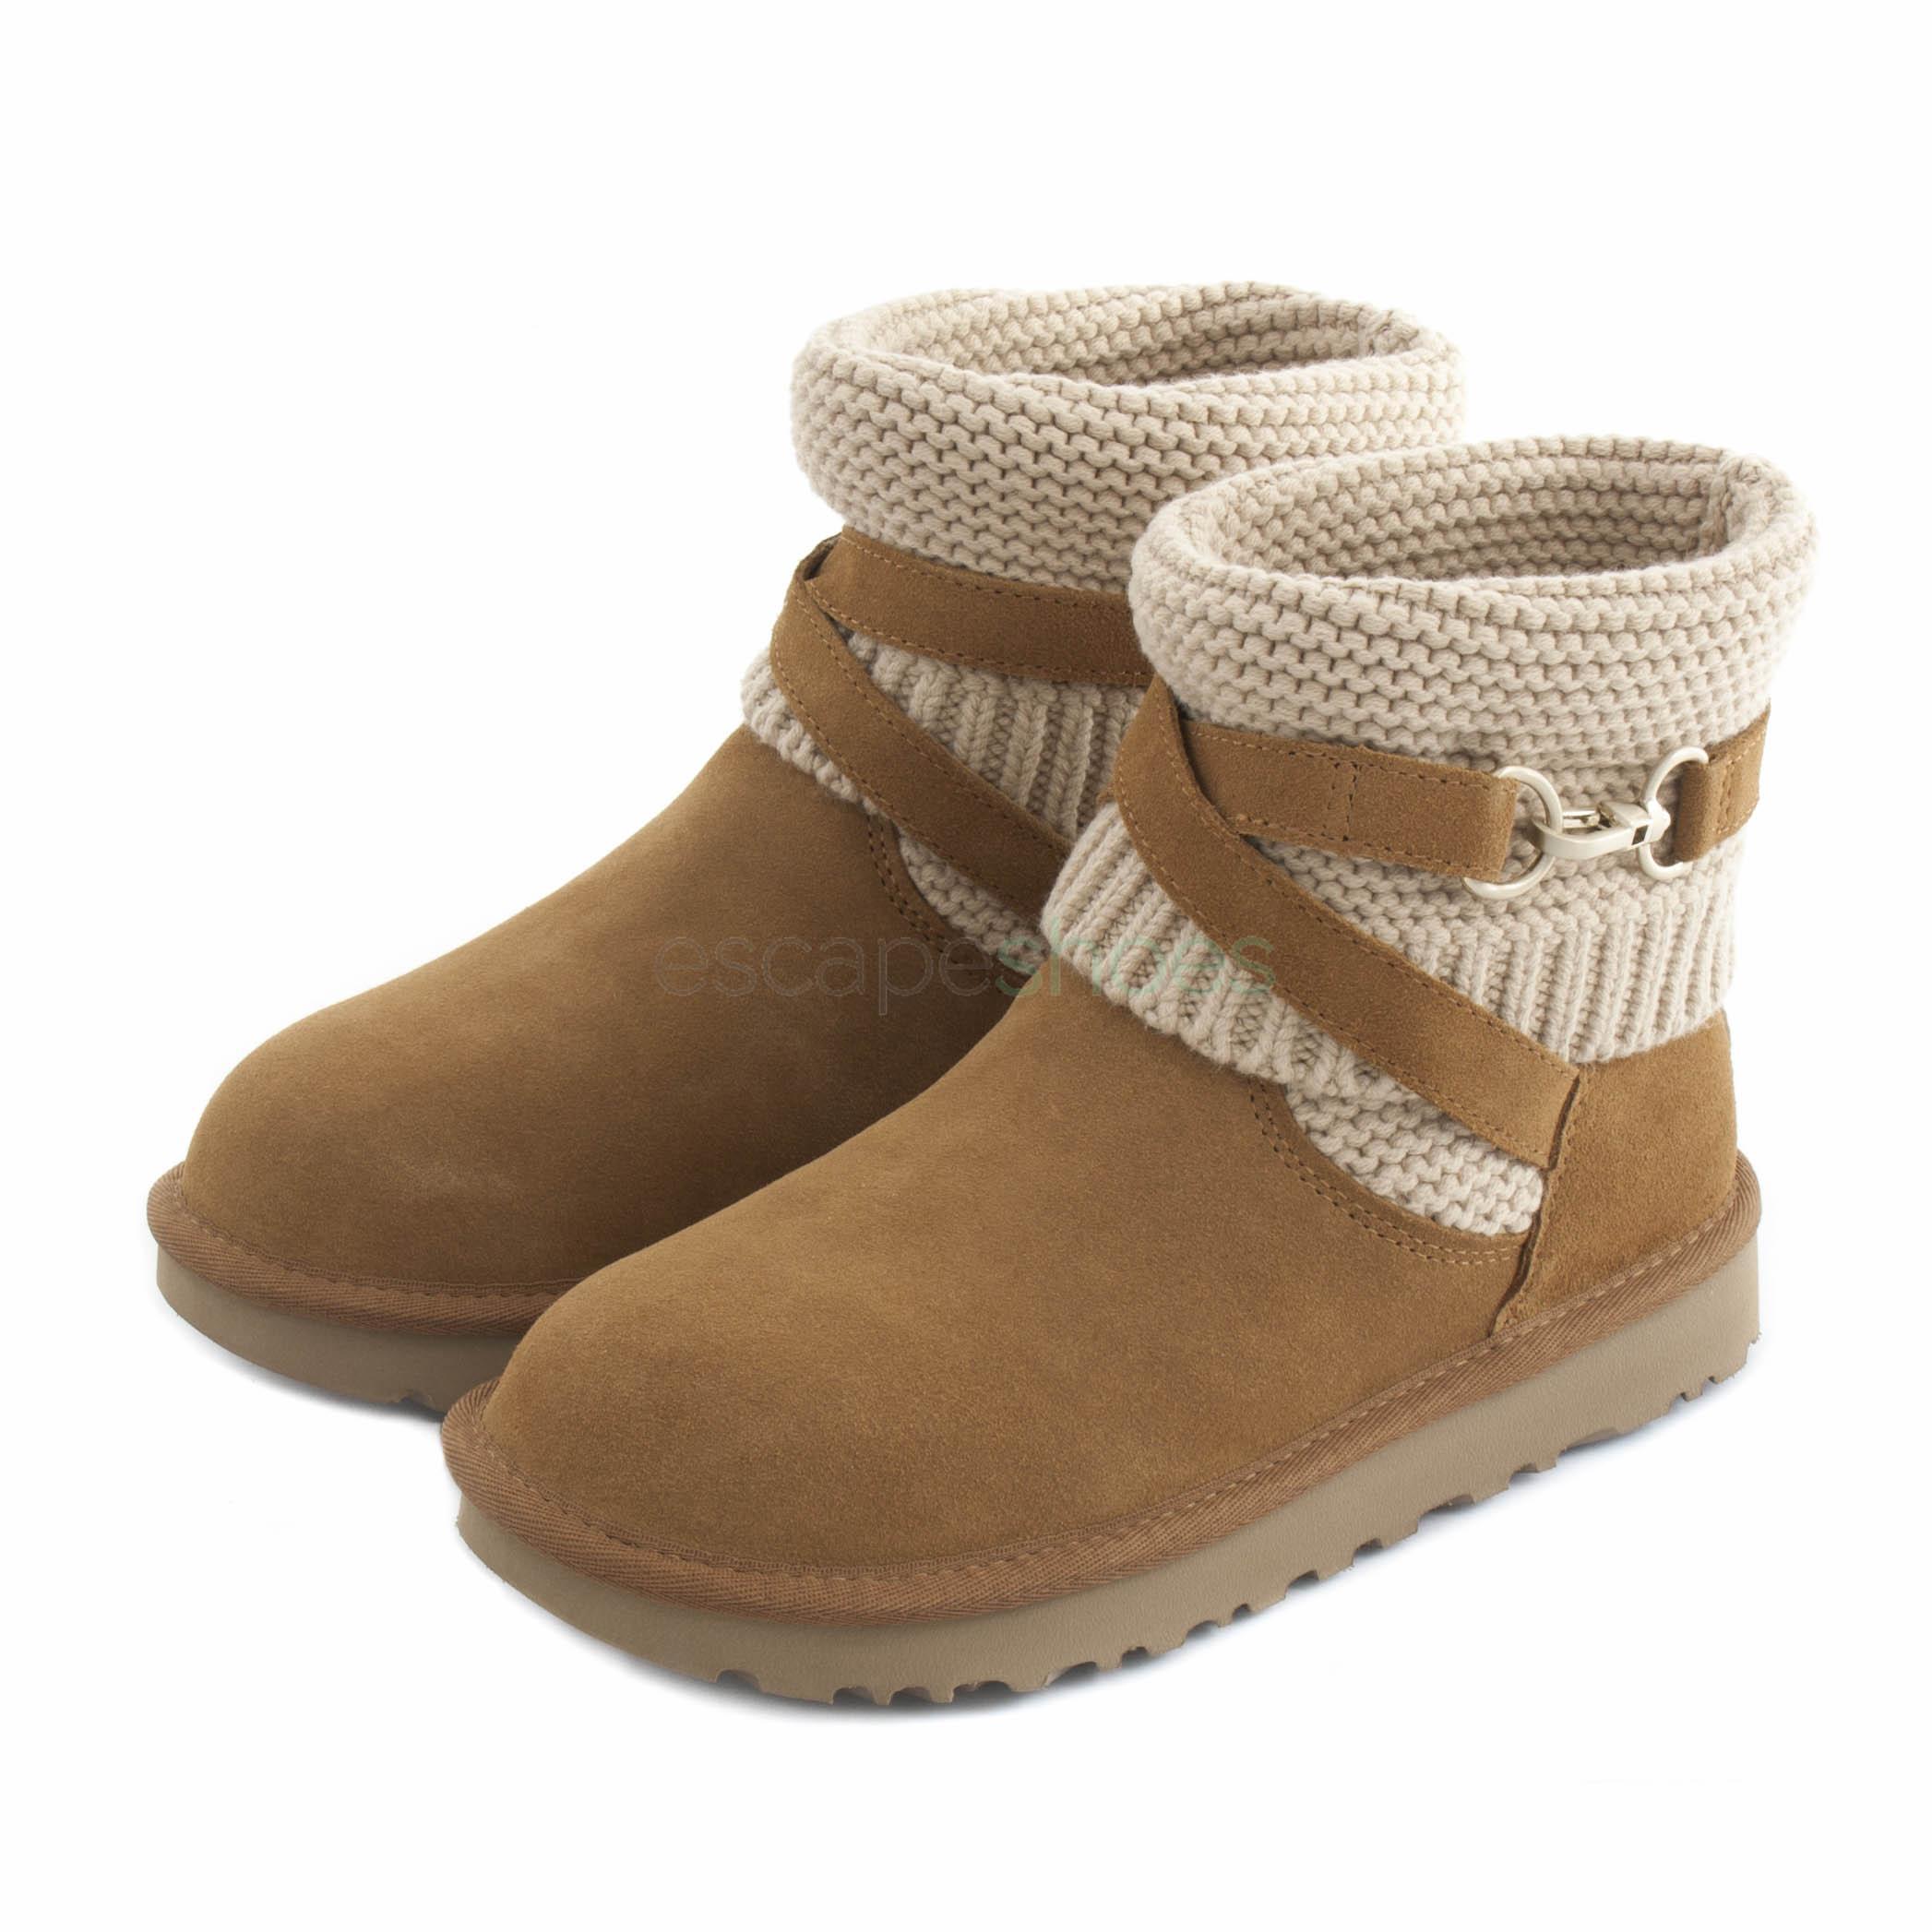 c4409d20daa Boots UGG Australia Purl Strap Brown